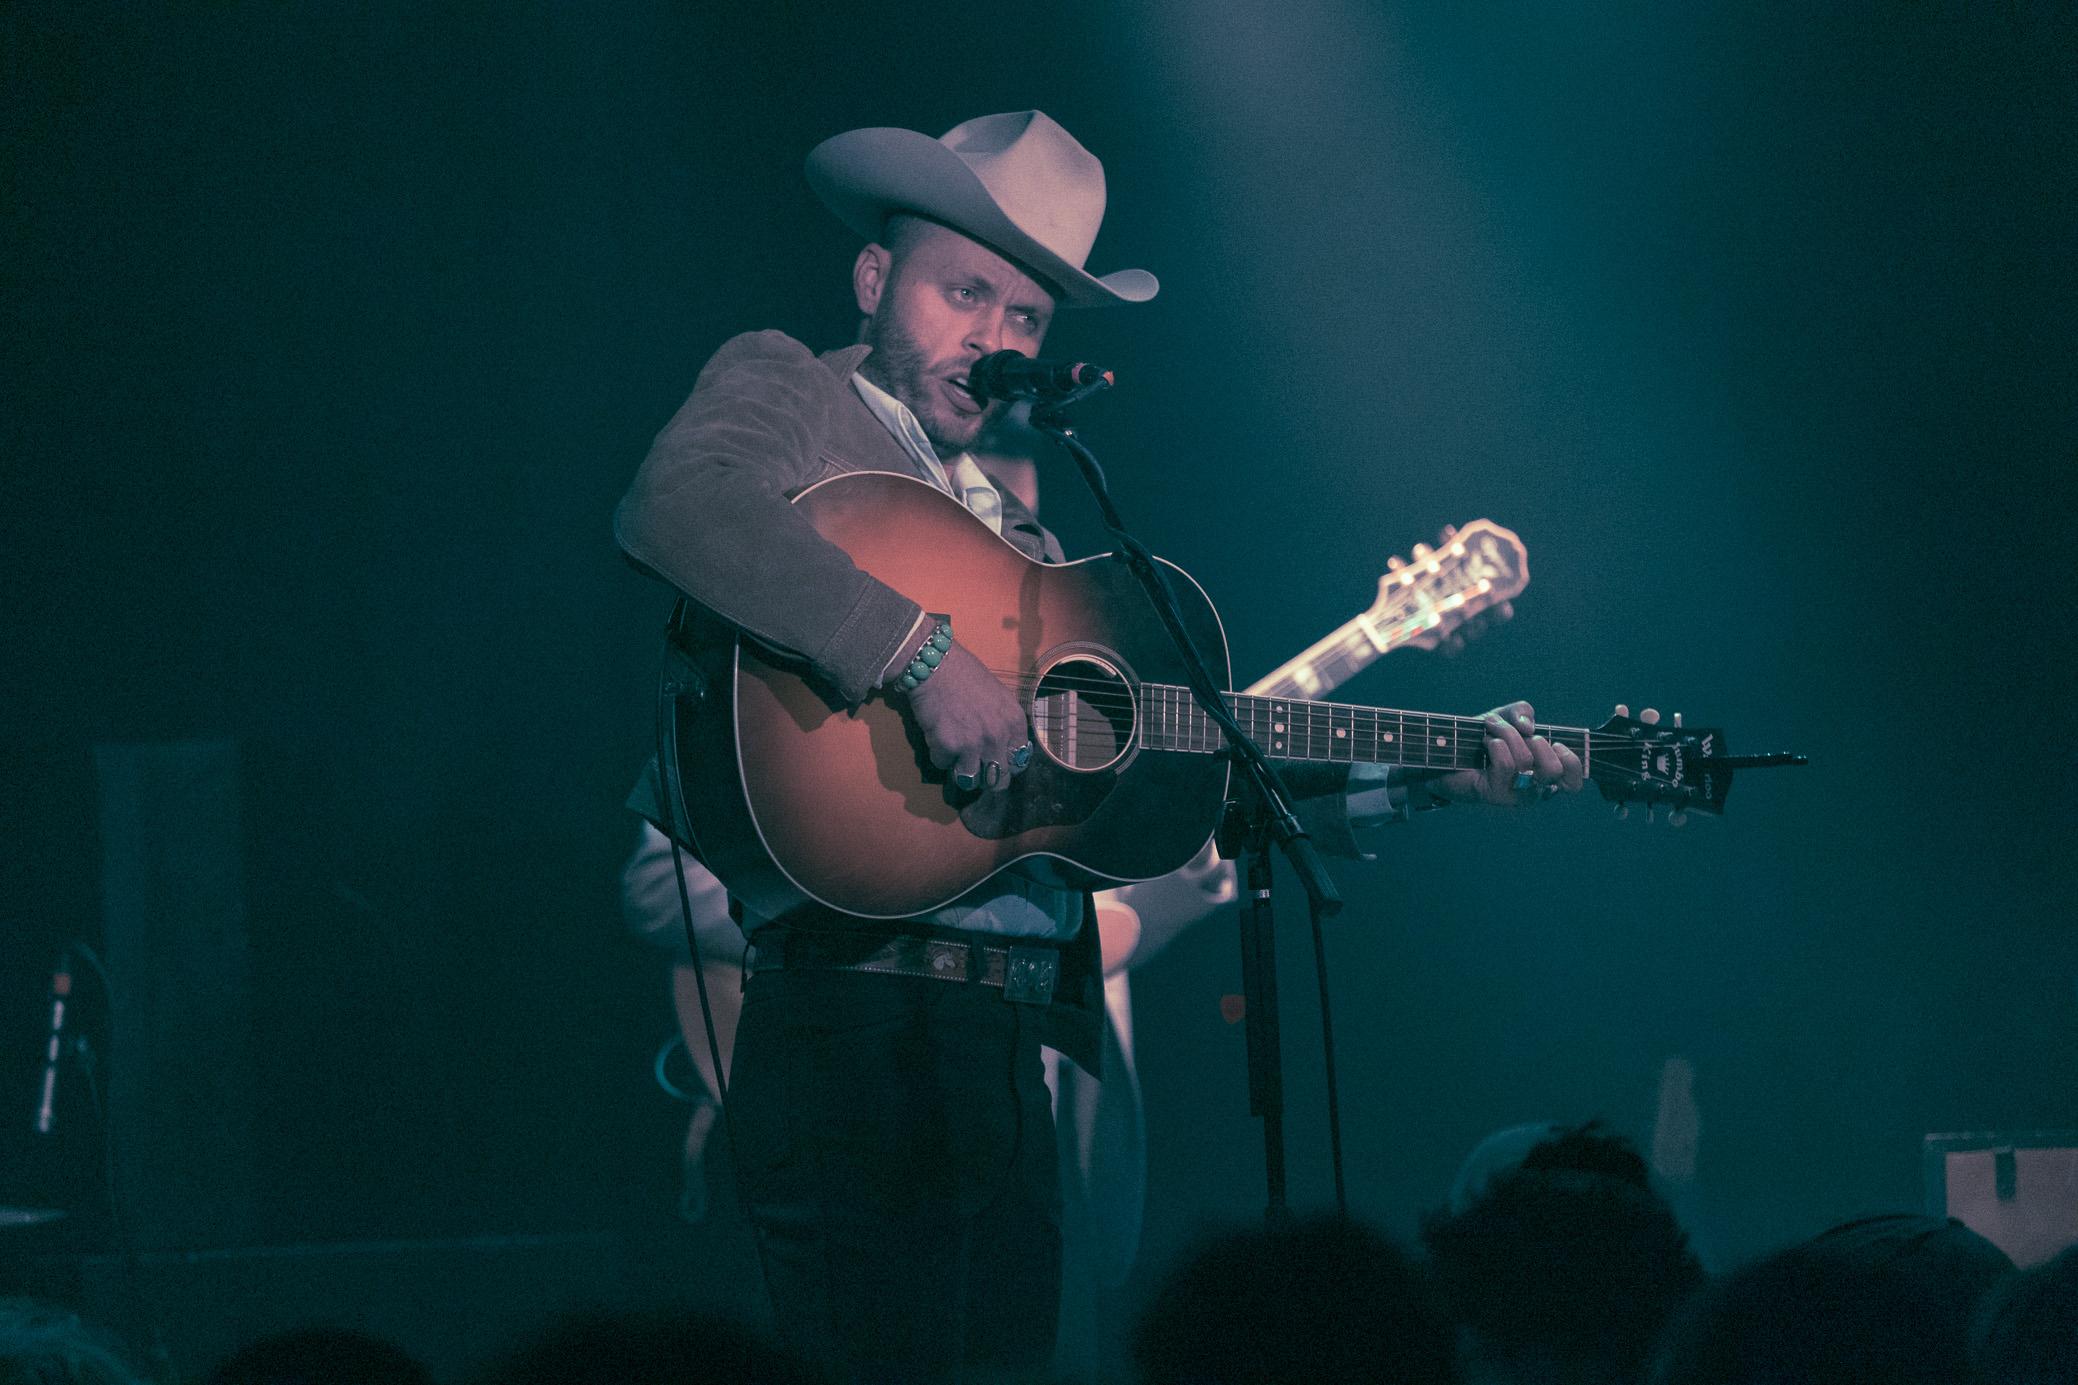 Charley Crockett Concert Photography